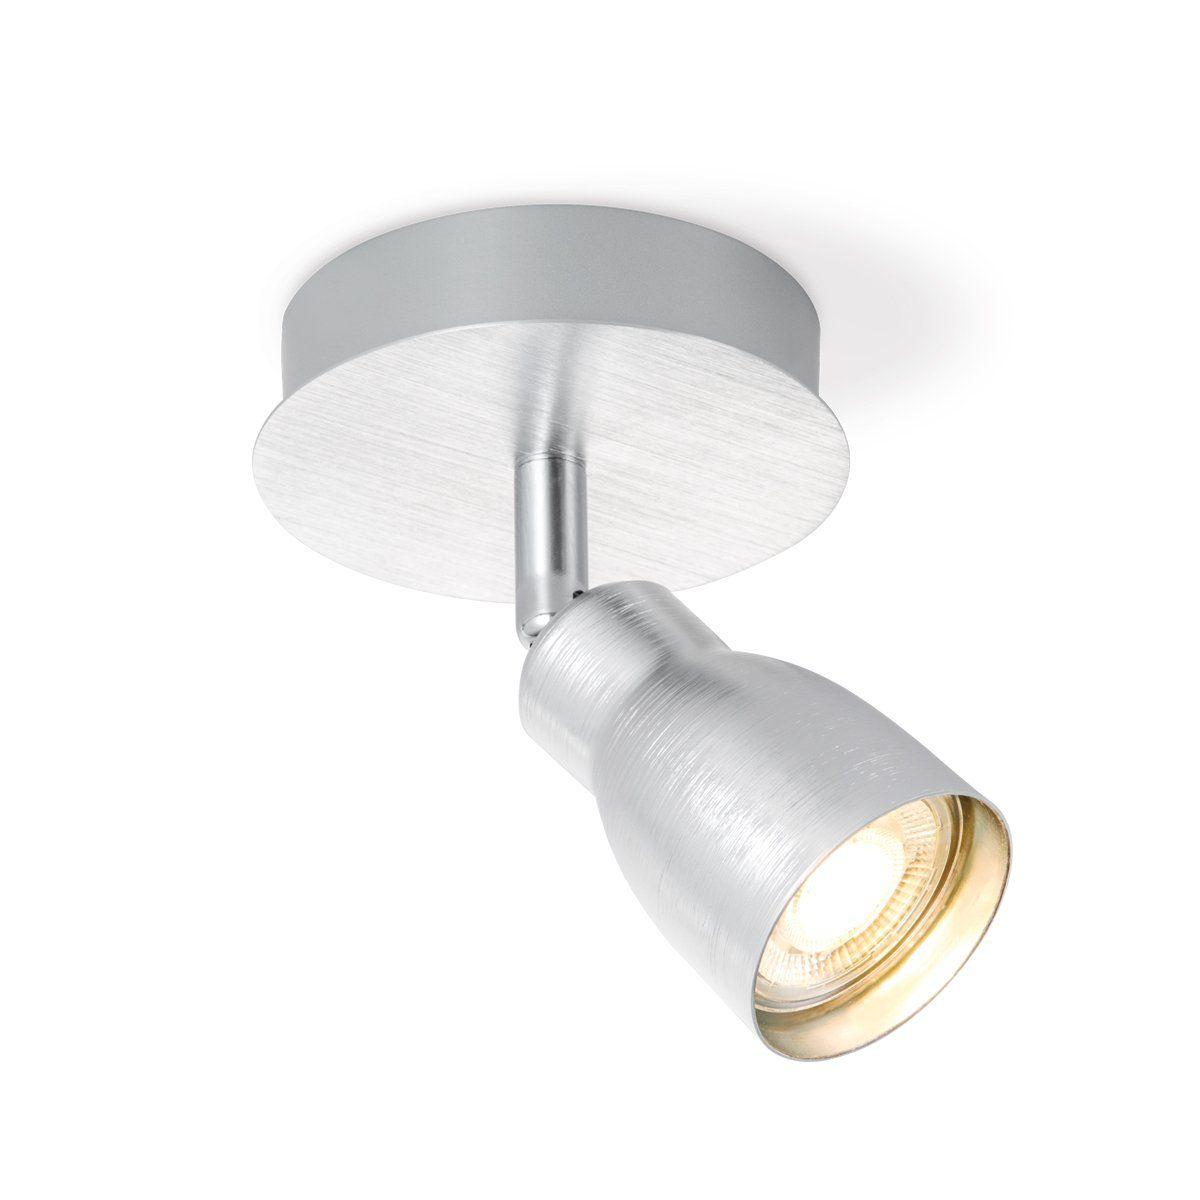 Home sweet home LED opbouwspot Alba � 11,5 cm - aluminium